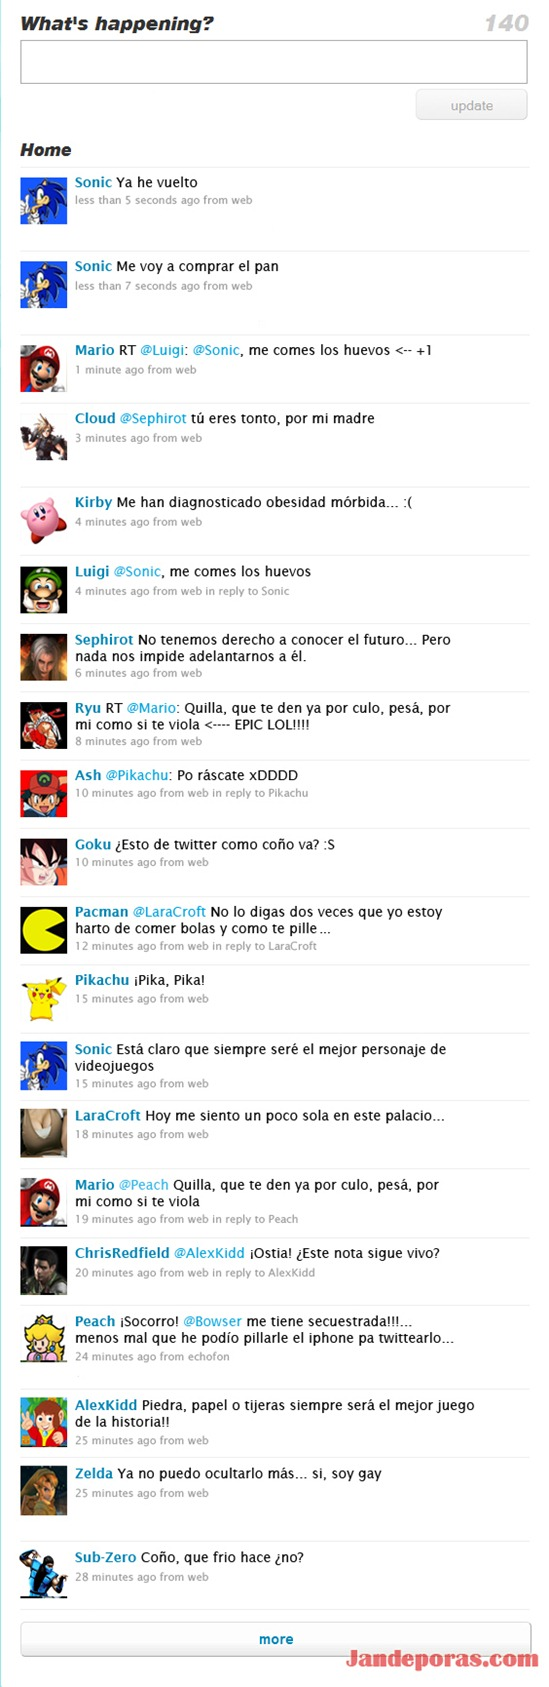 Games - Twitter